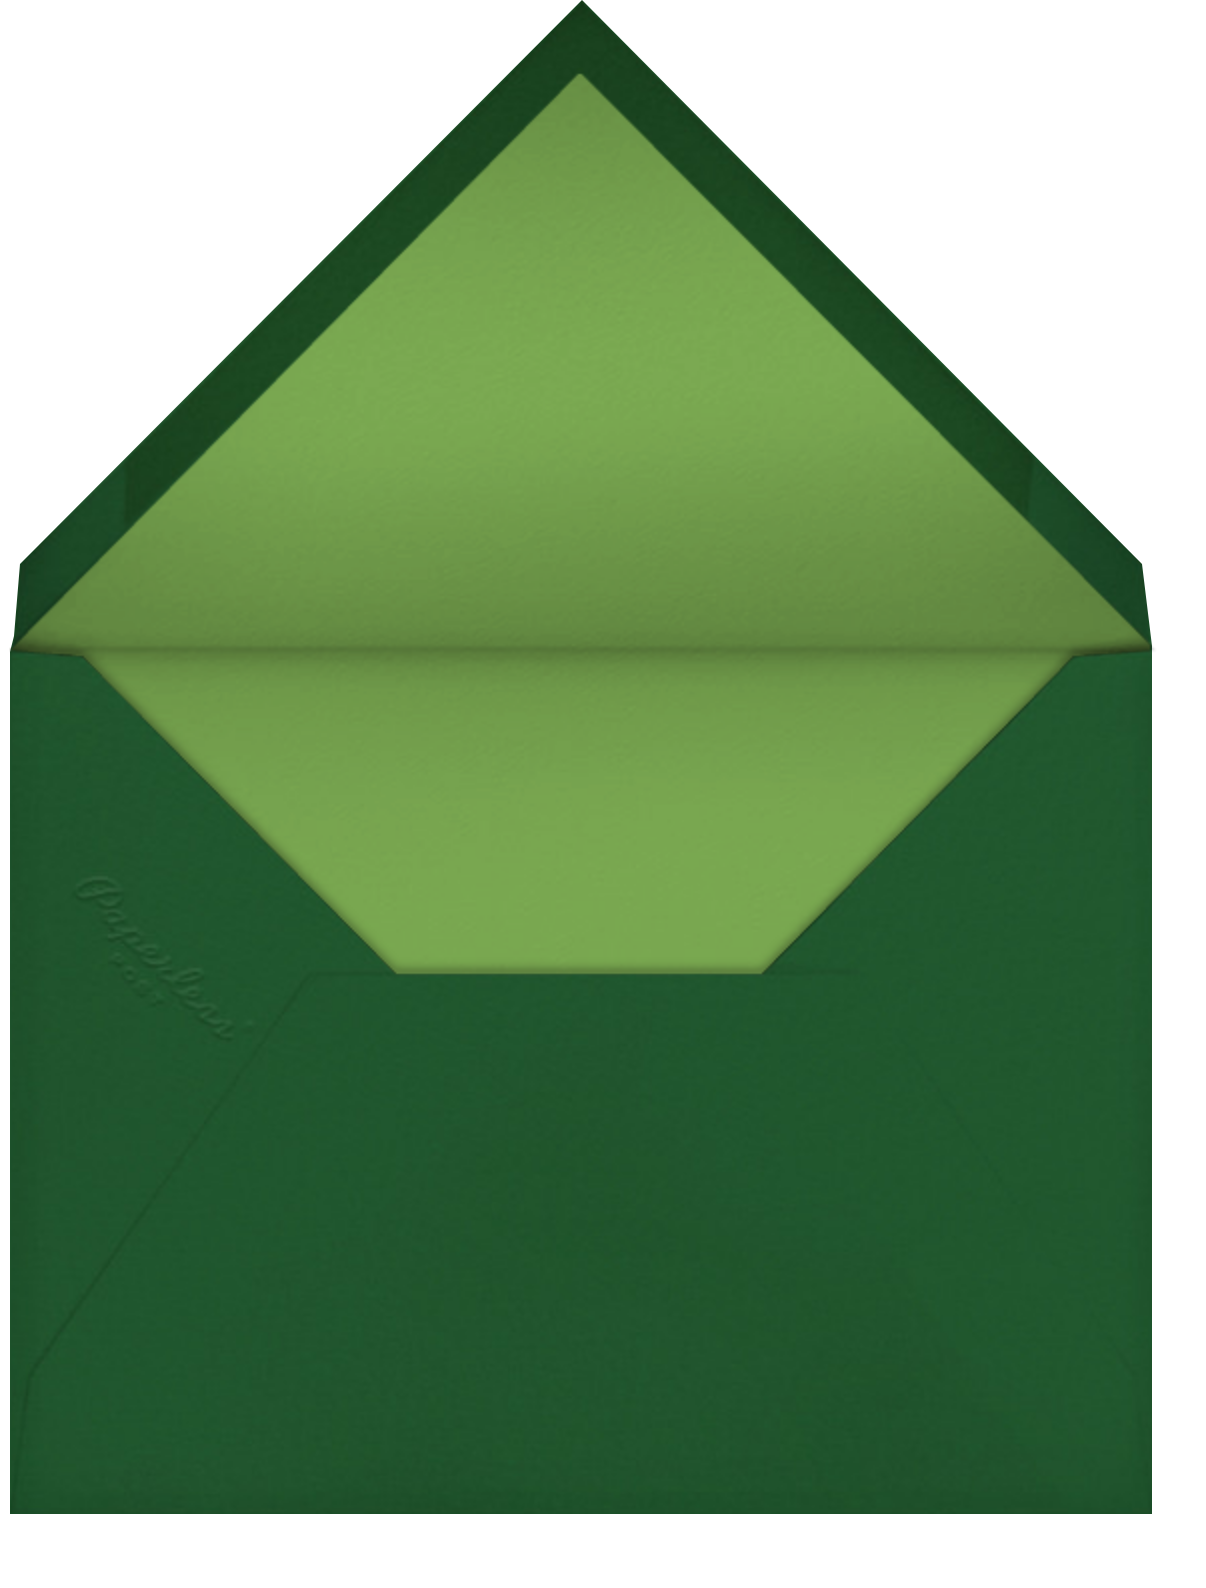 Fern II (Invitation) - Green - Paperless Post - All - envelope back